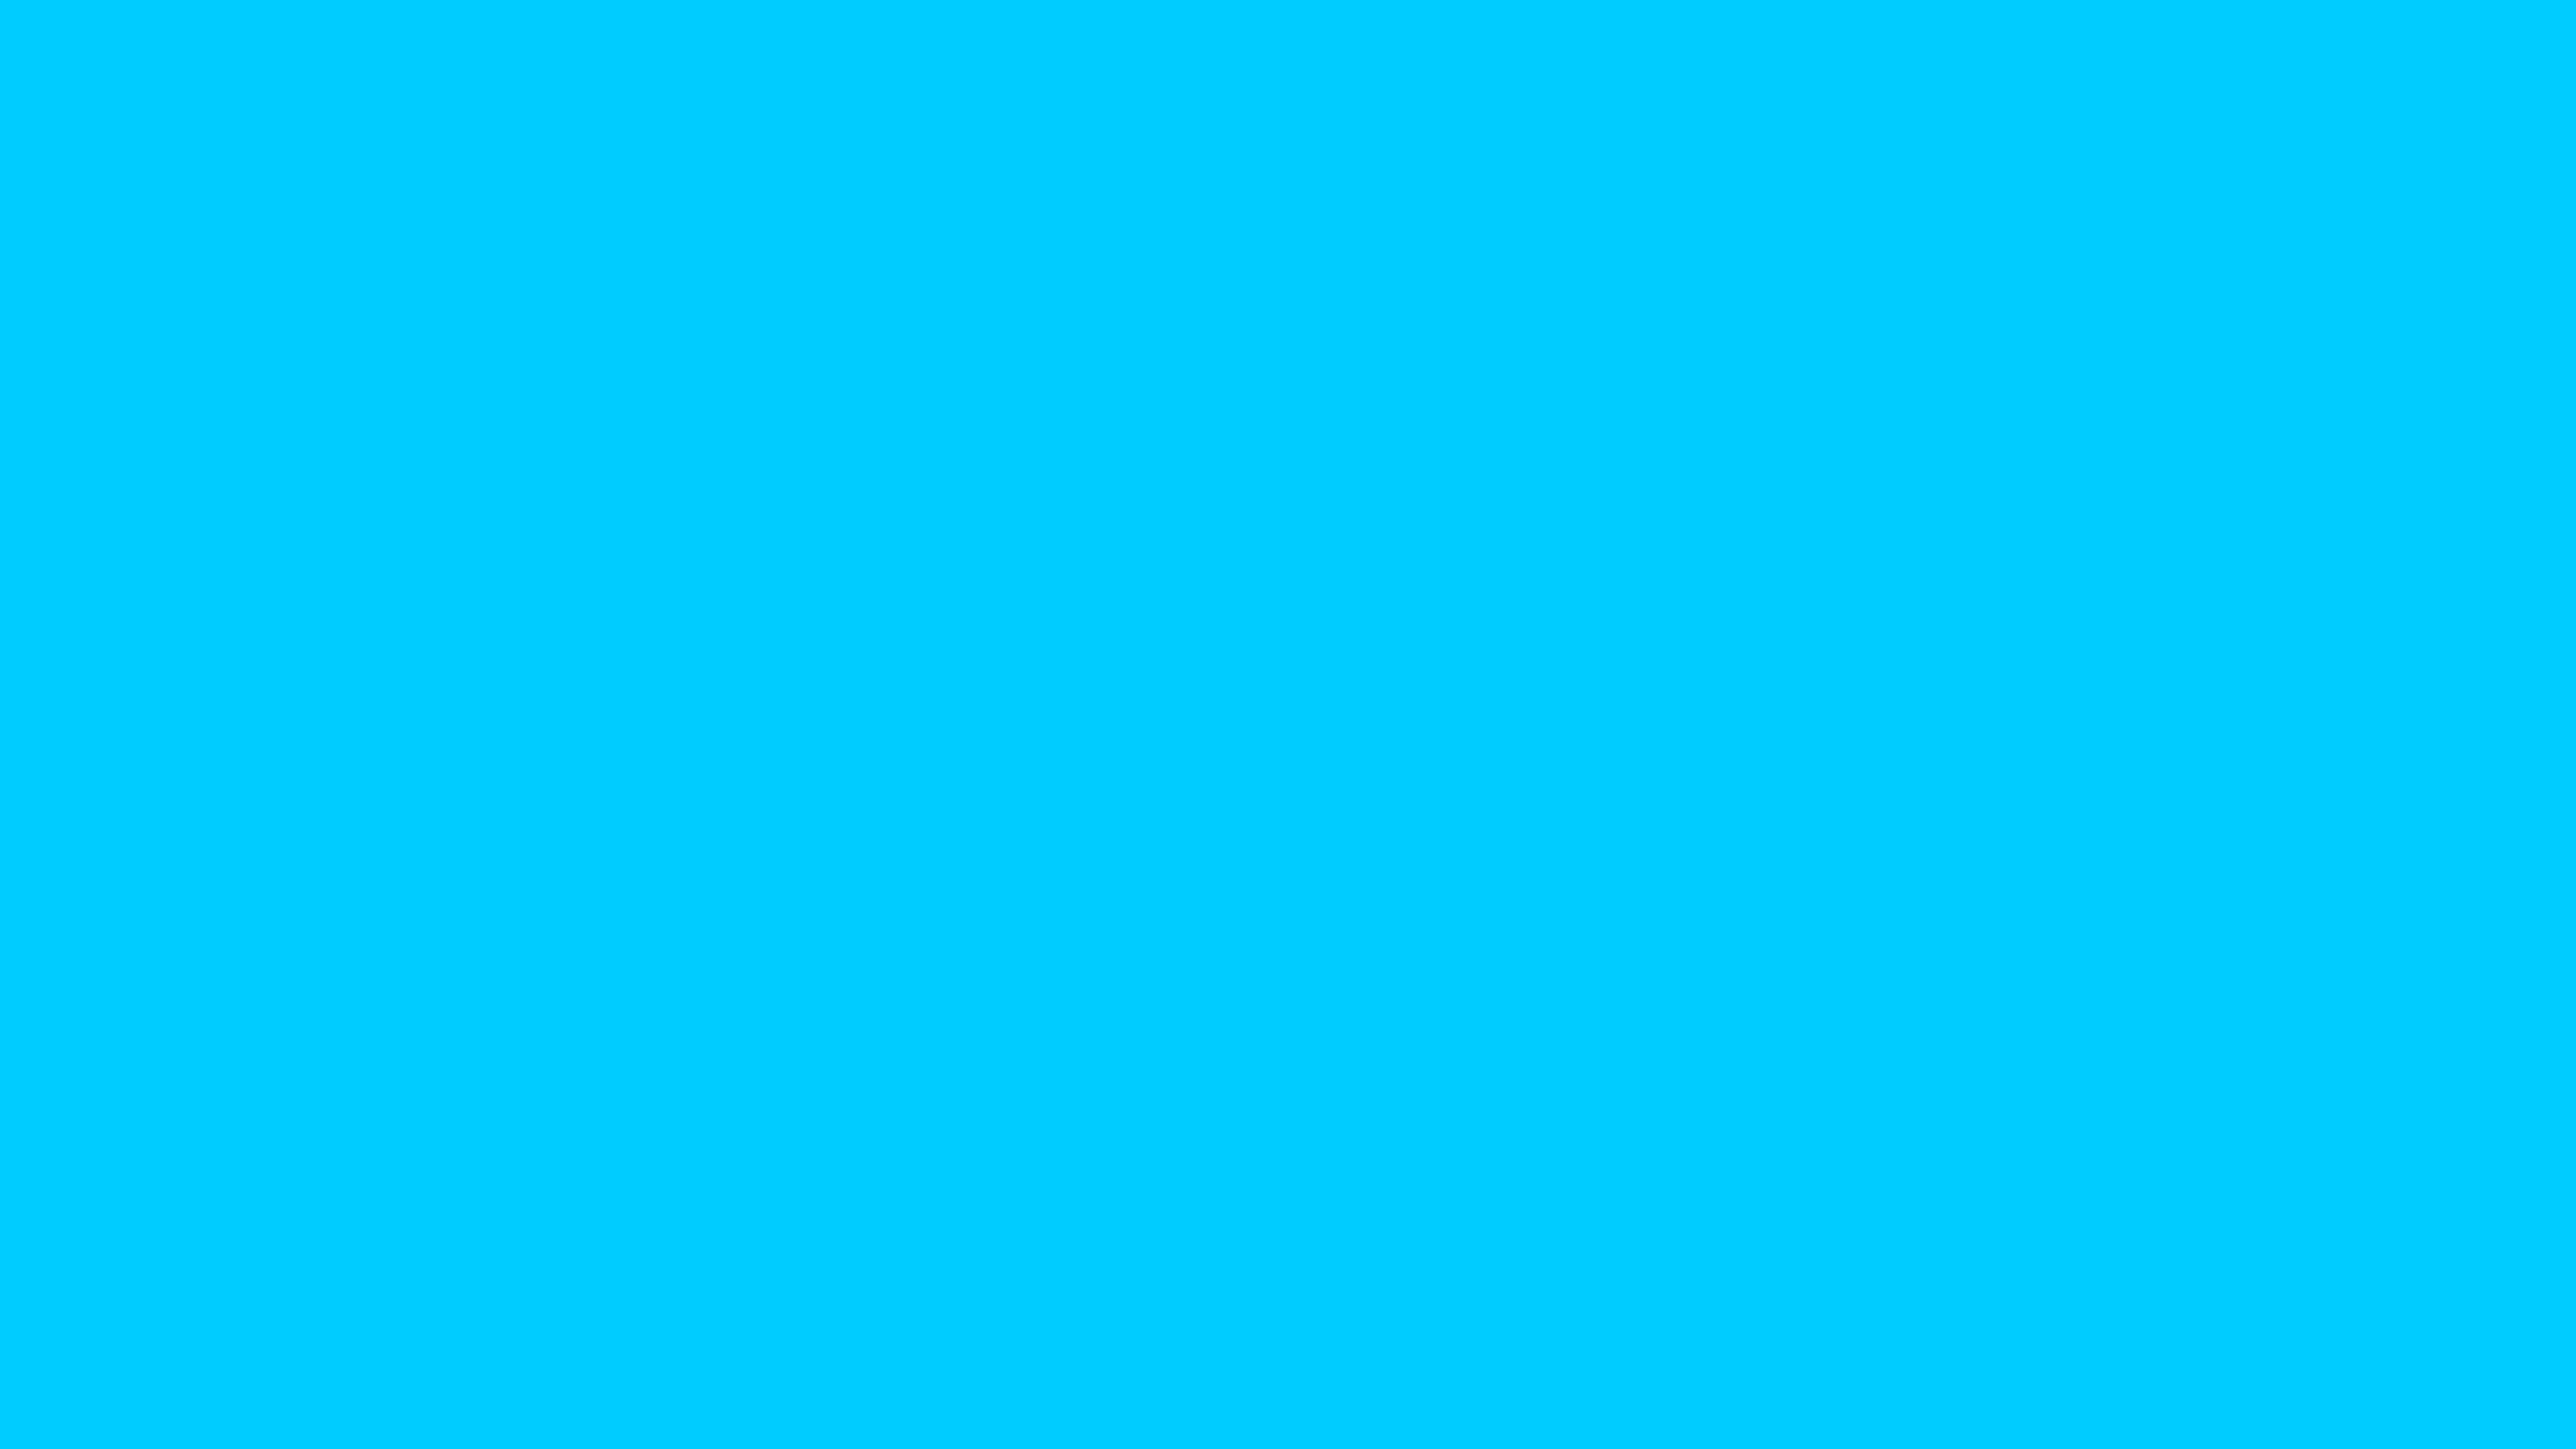 4096x2304 Vivid Sky Blue Solid Color Background